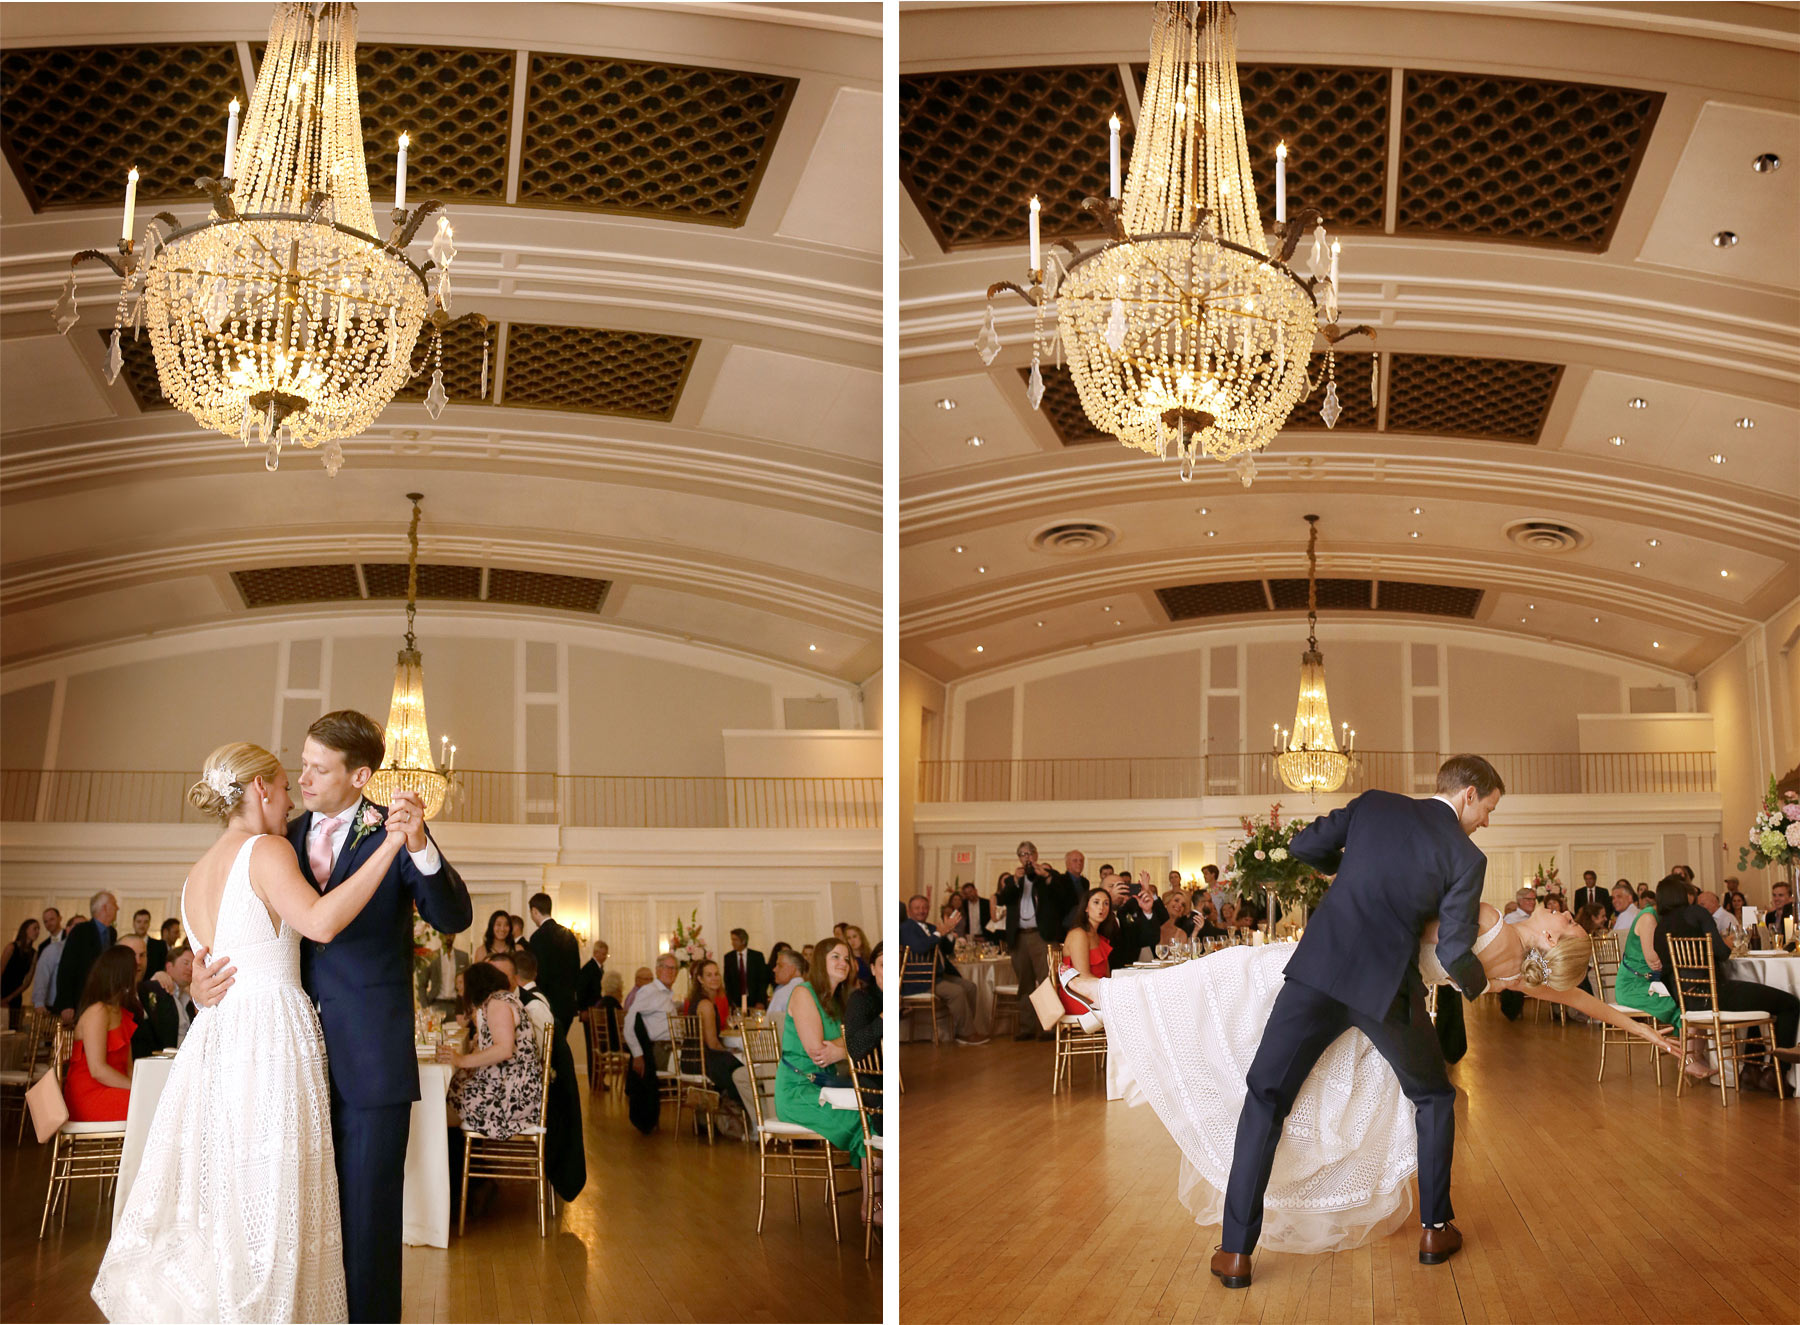 19-Minneapolis-Minnesota-Wedding-Photography-by-Vick-Photography-Lafayette-Club-Reception-Dance-Maggie-and-Nicholas.jpg